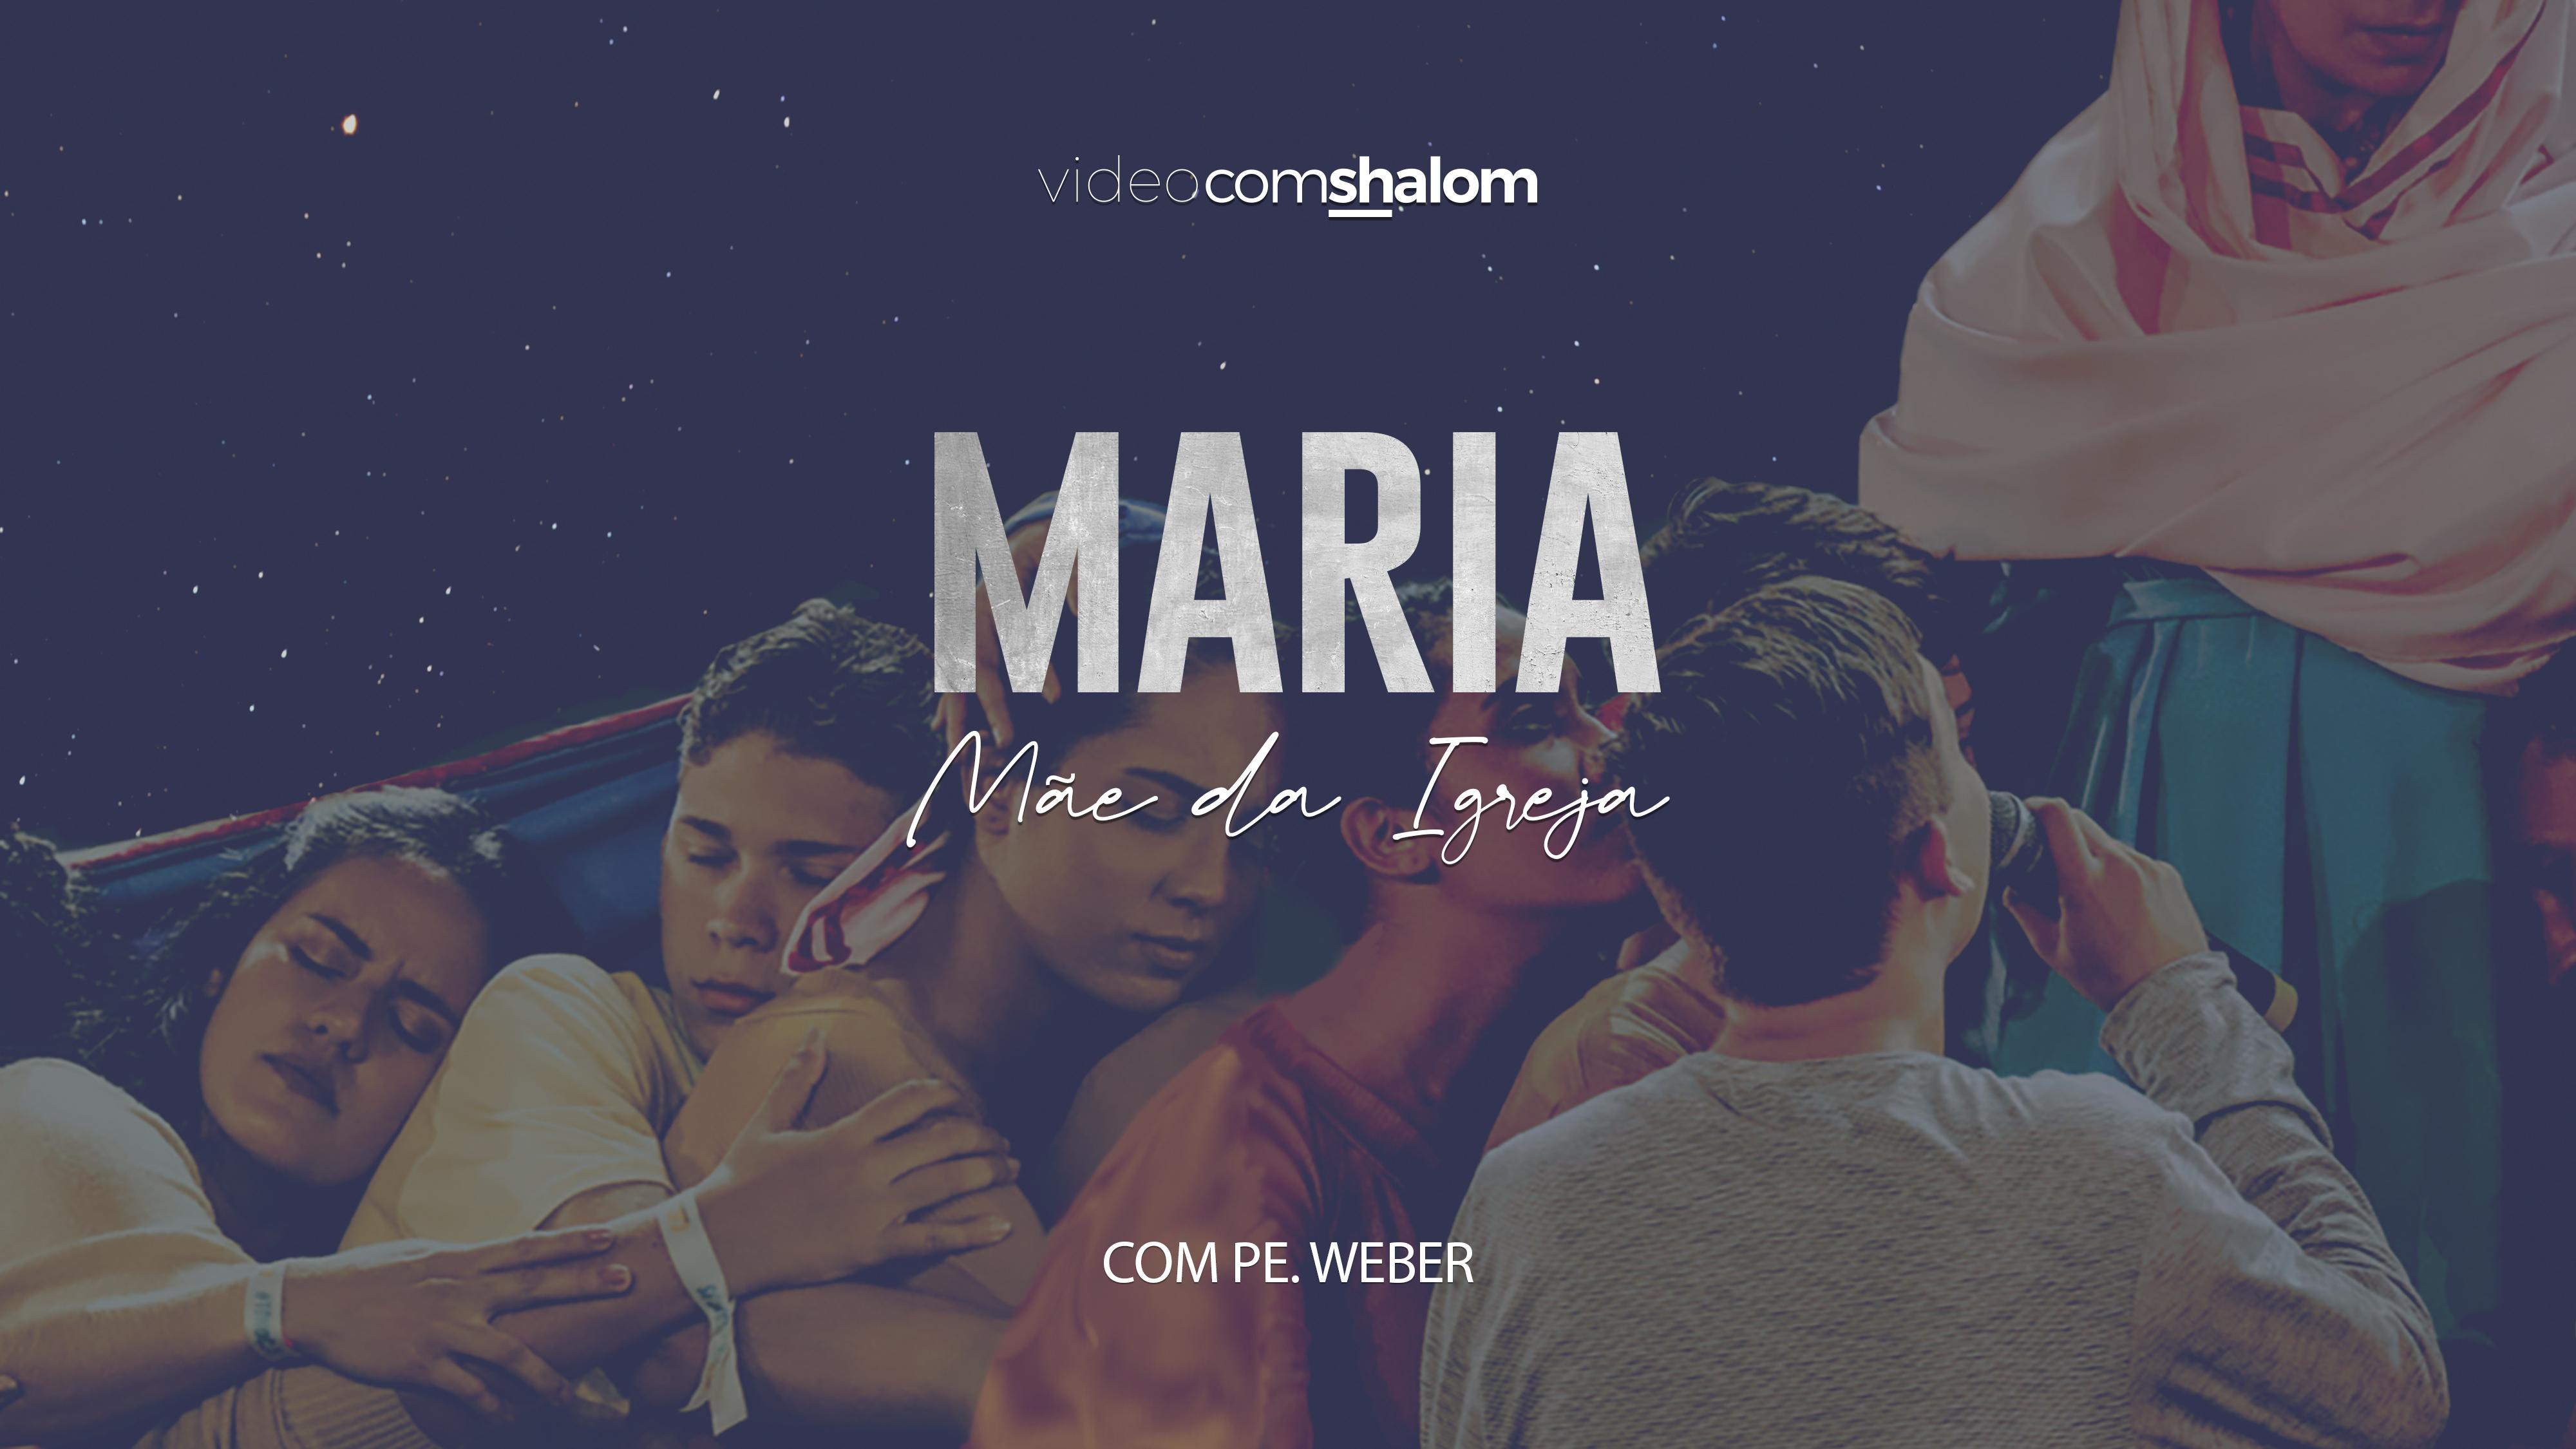 Maria%2bm%c3%a3e%2bda%2bigreja   card%2b3